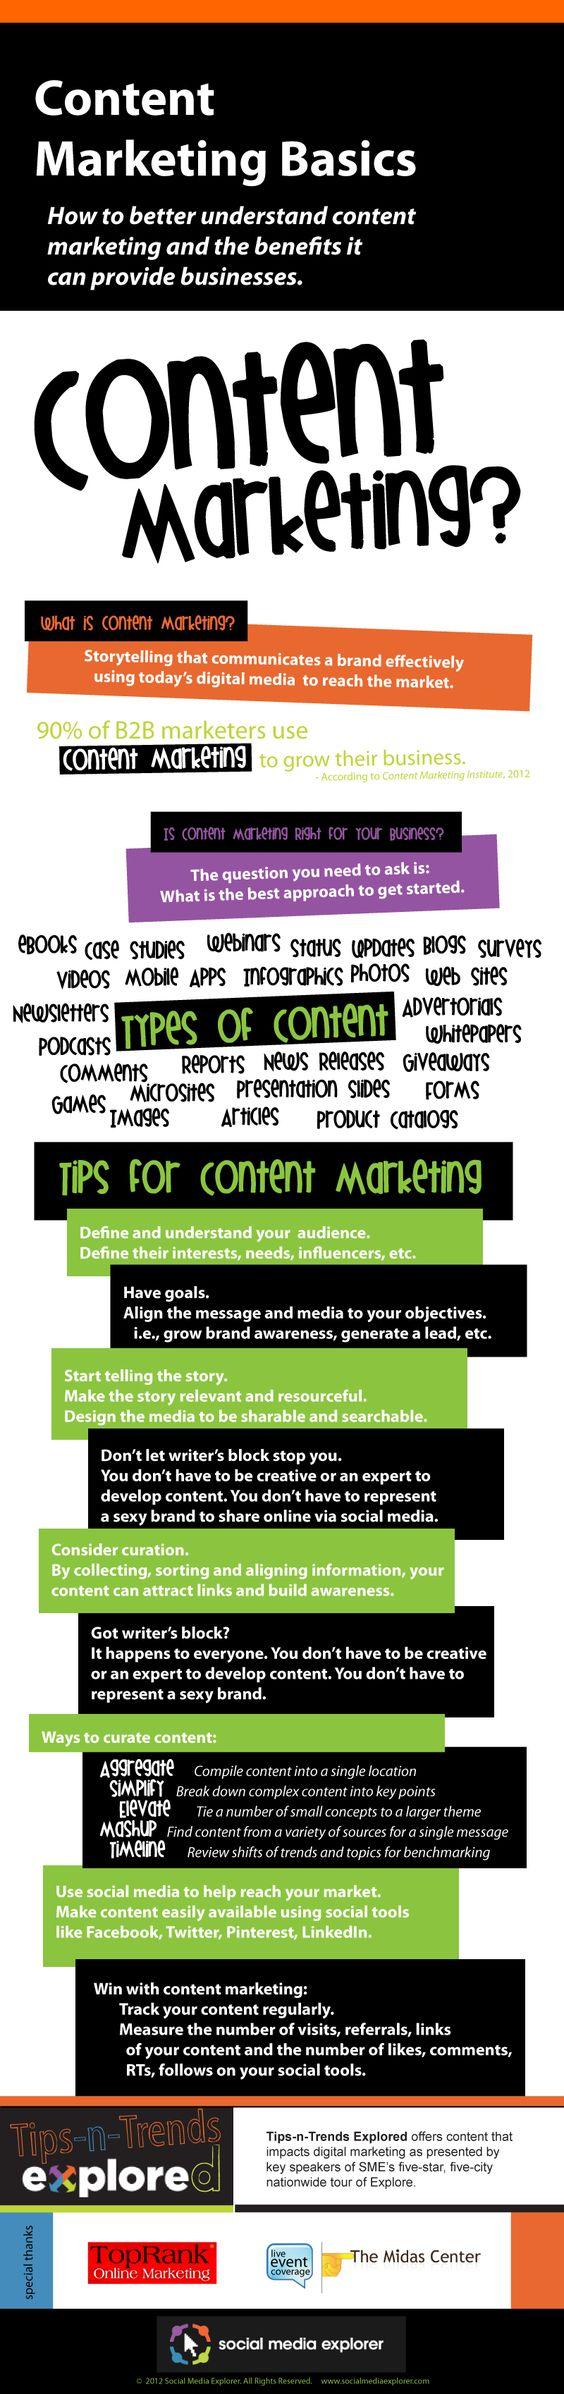 #Content #Marketing